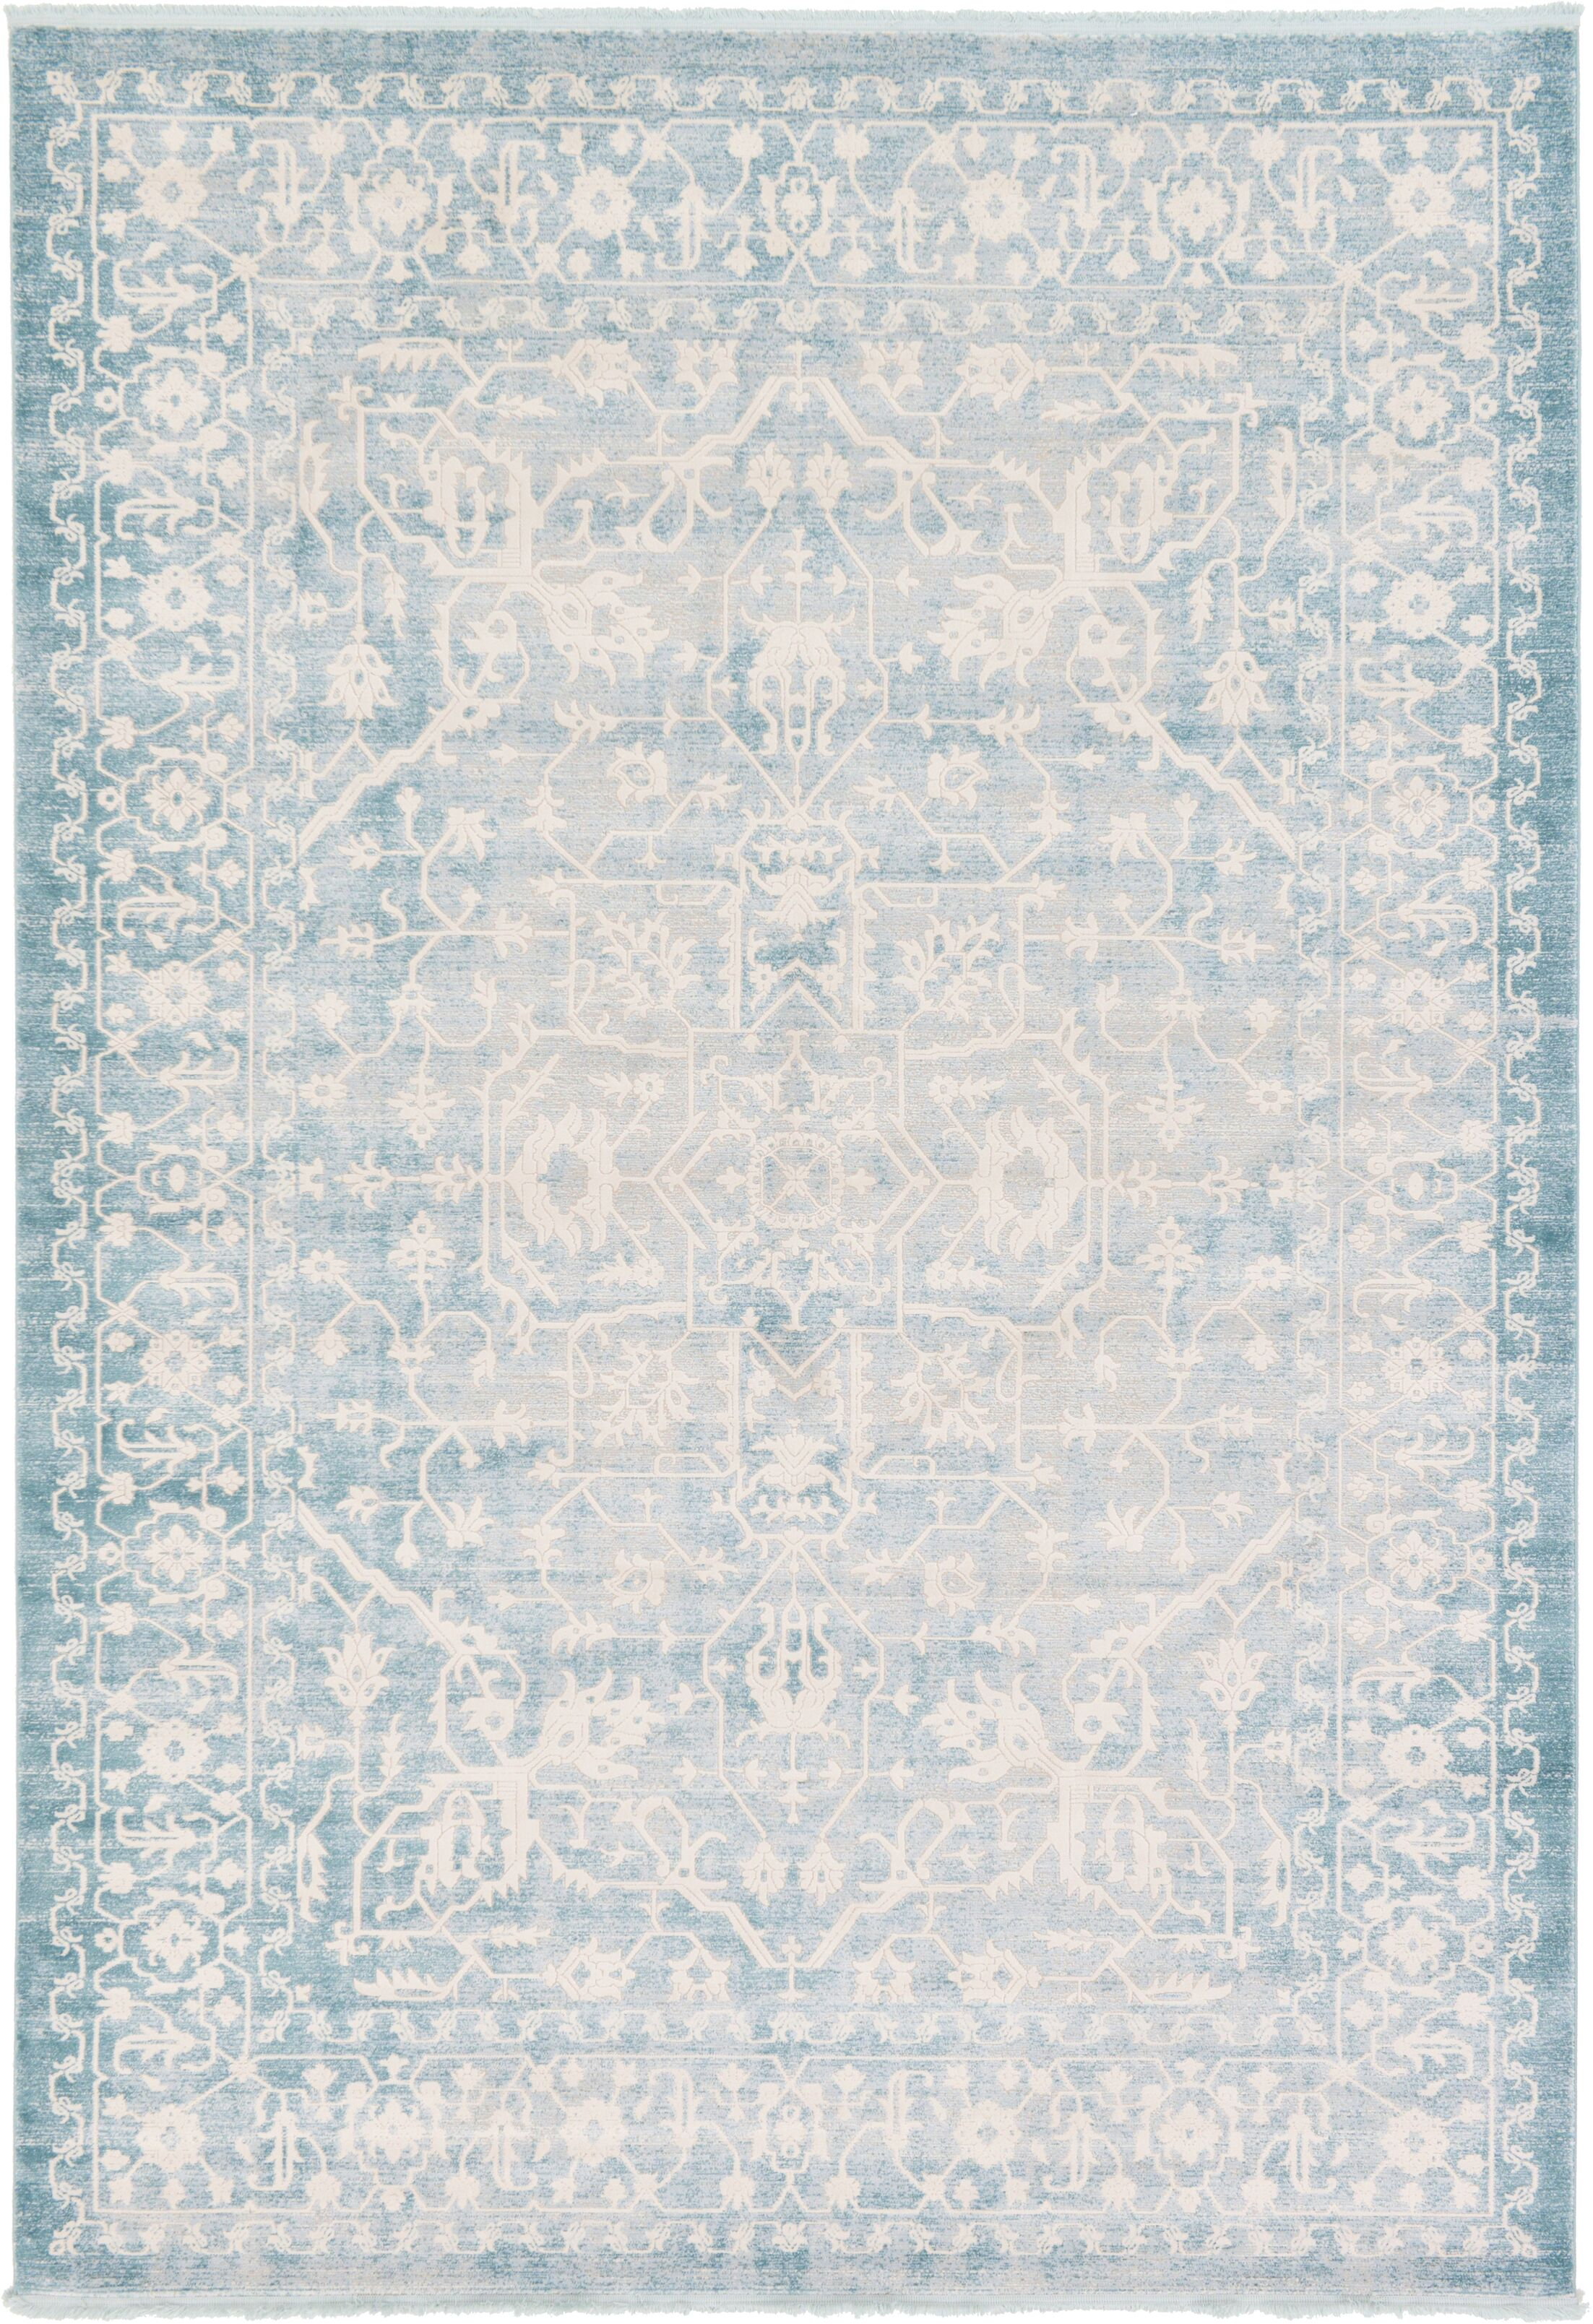 Bryant Oriental Light Blue Area Rug Rug Size: Rectangle 8' x 11'